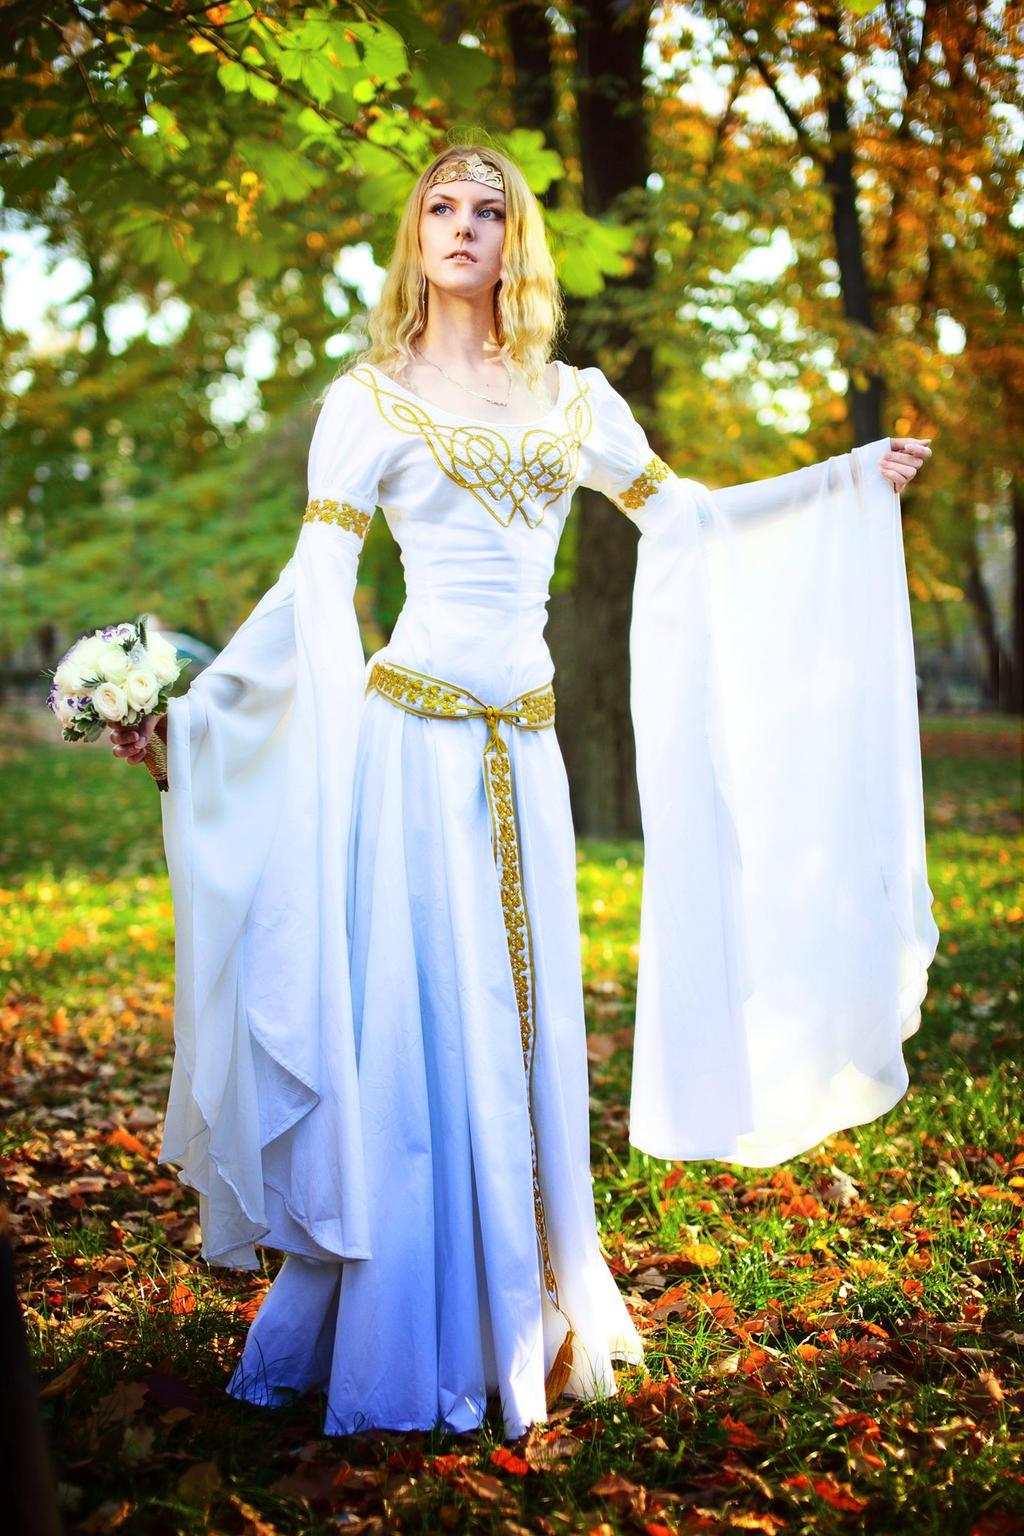 The Elven Wedding Dress By Ainaven On Deviantart